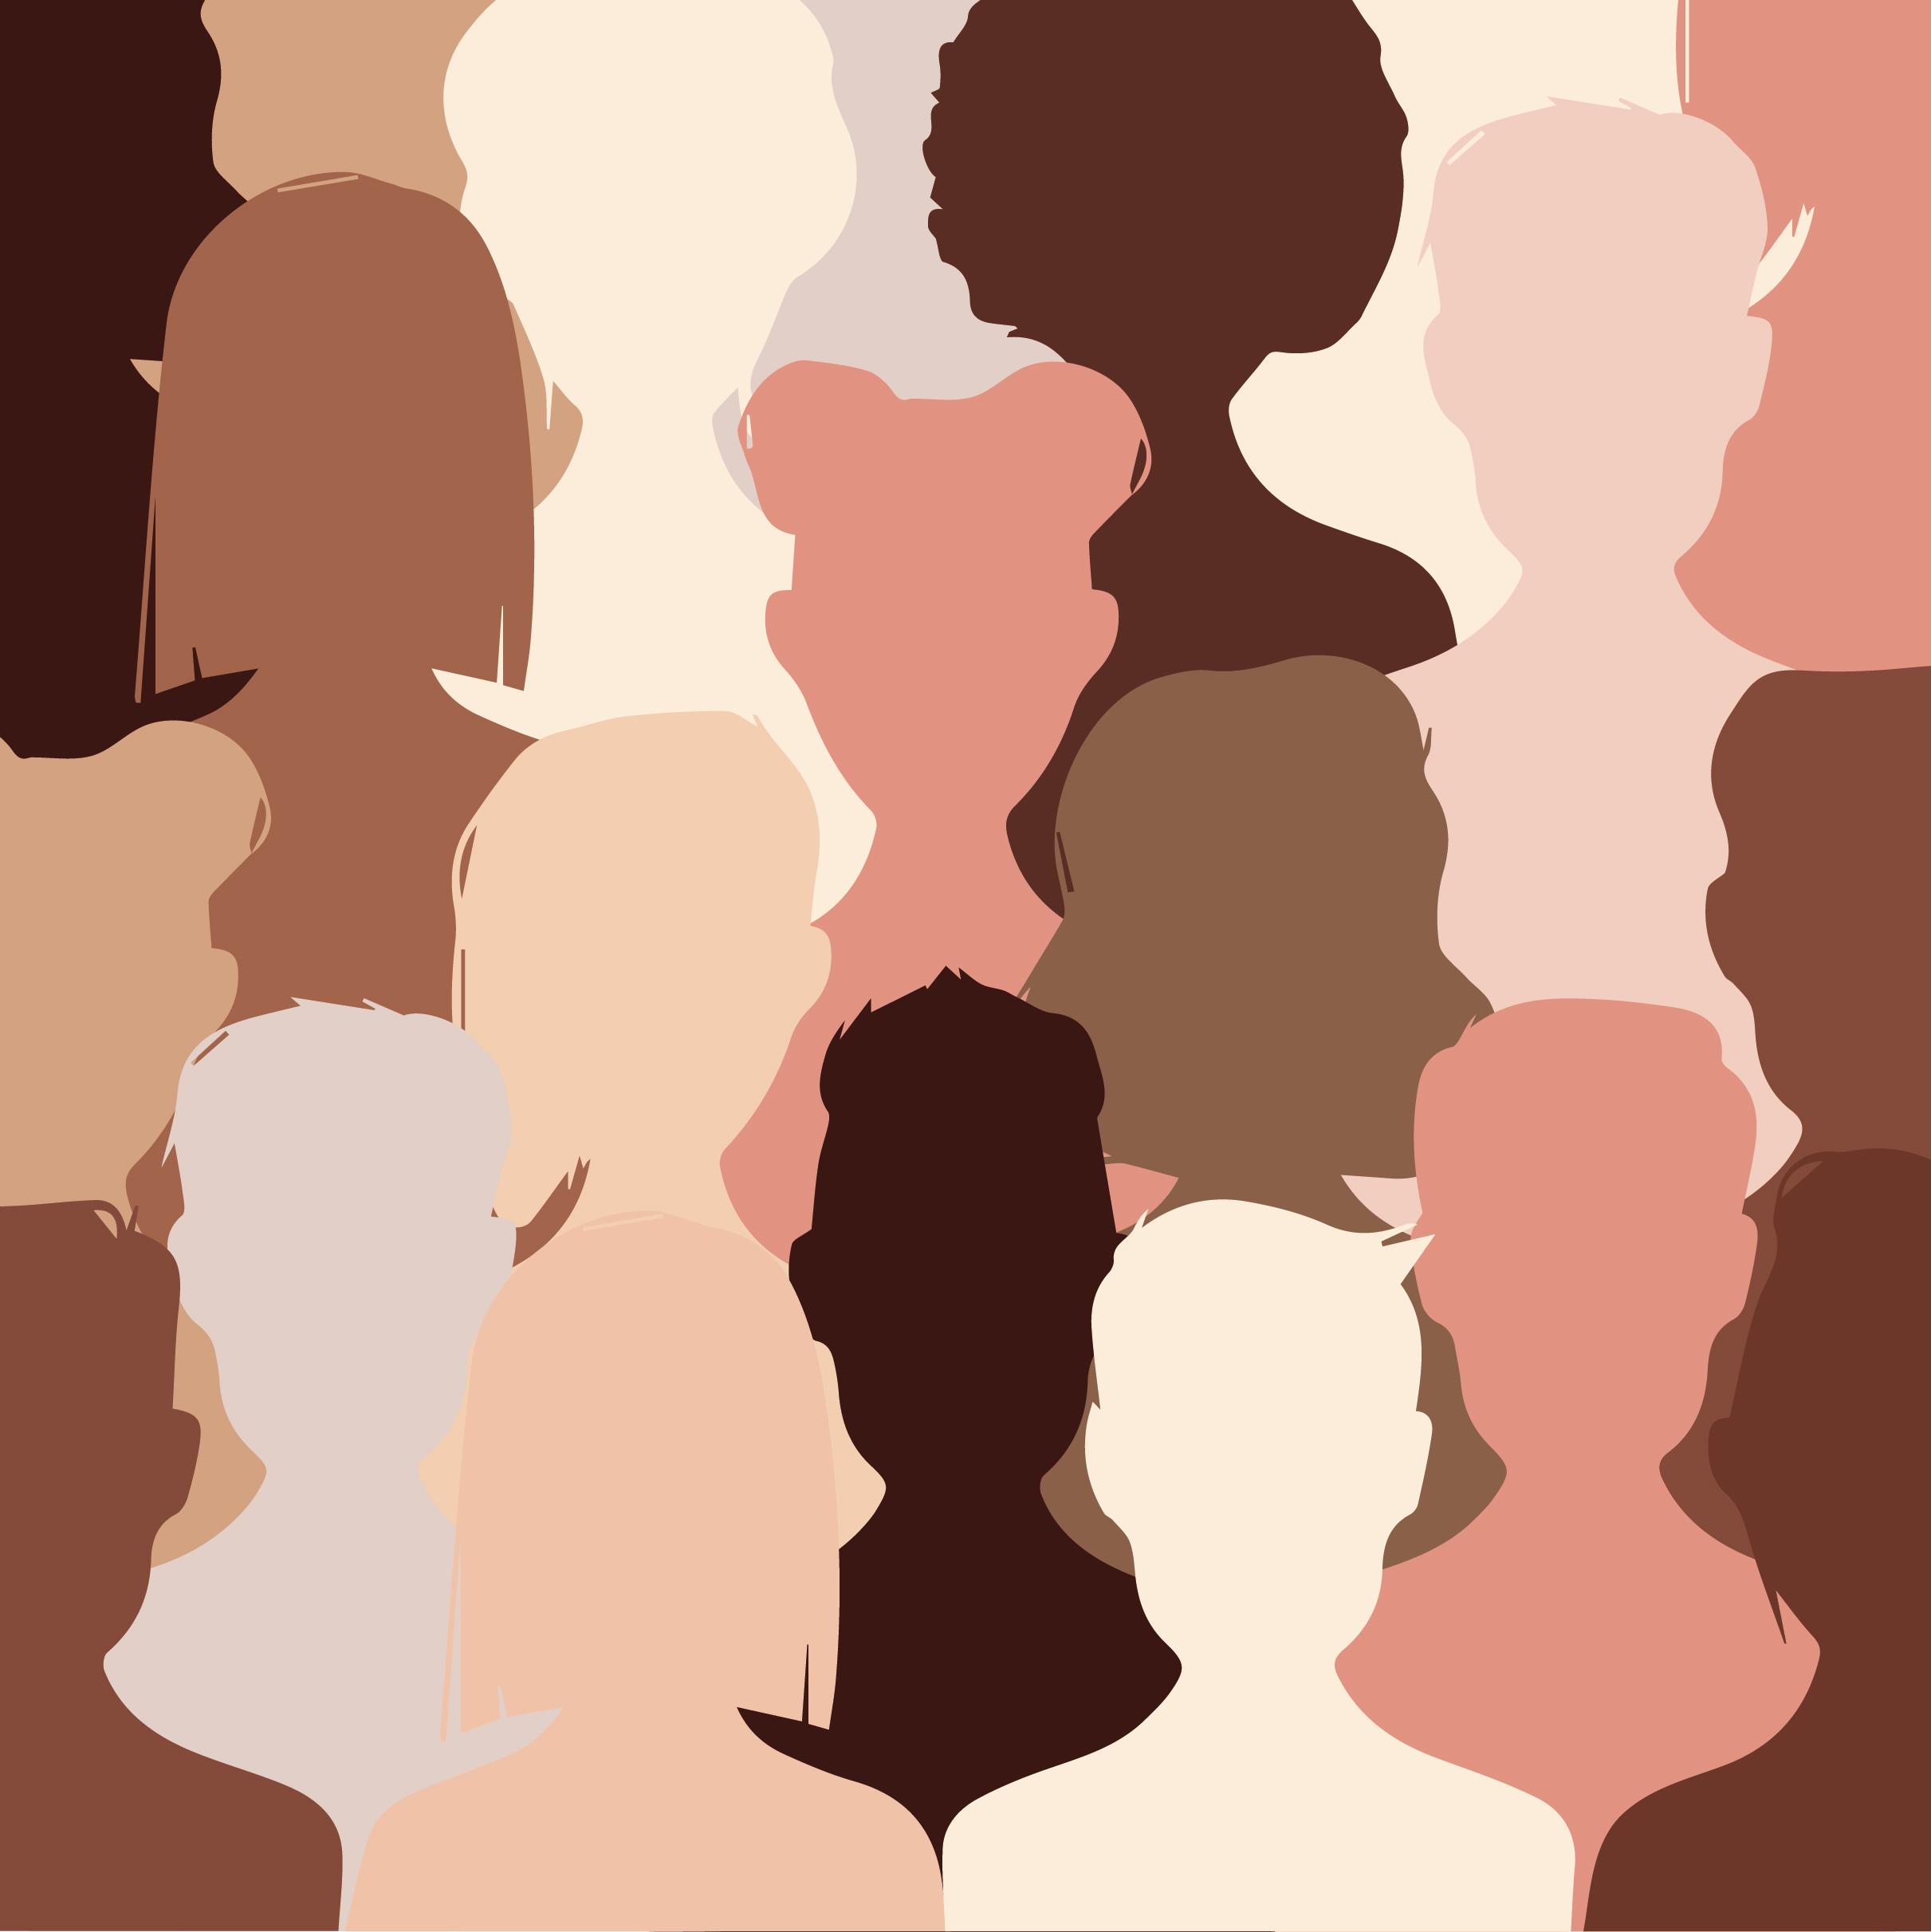 people-races-image